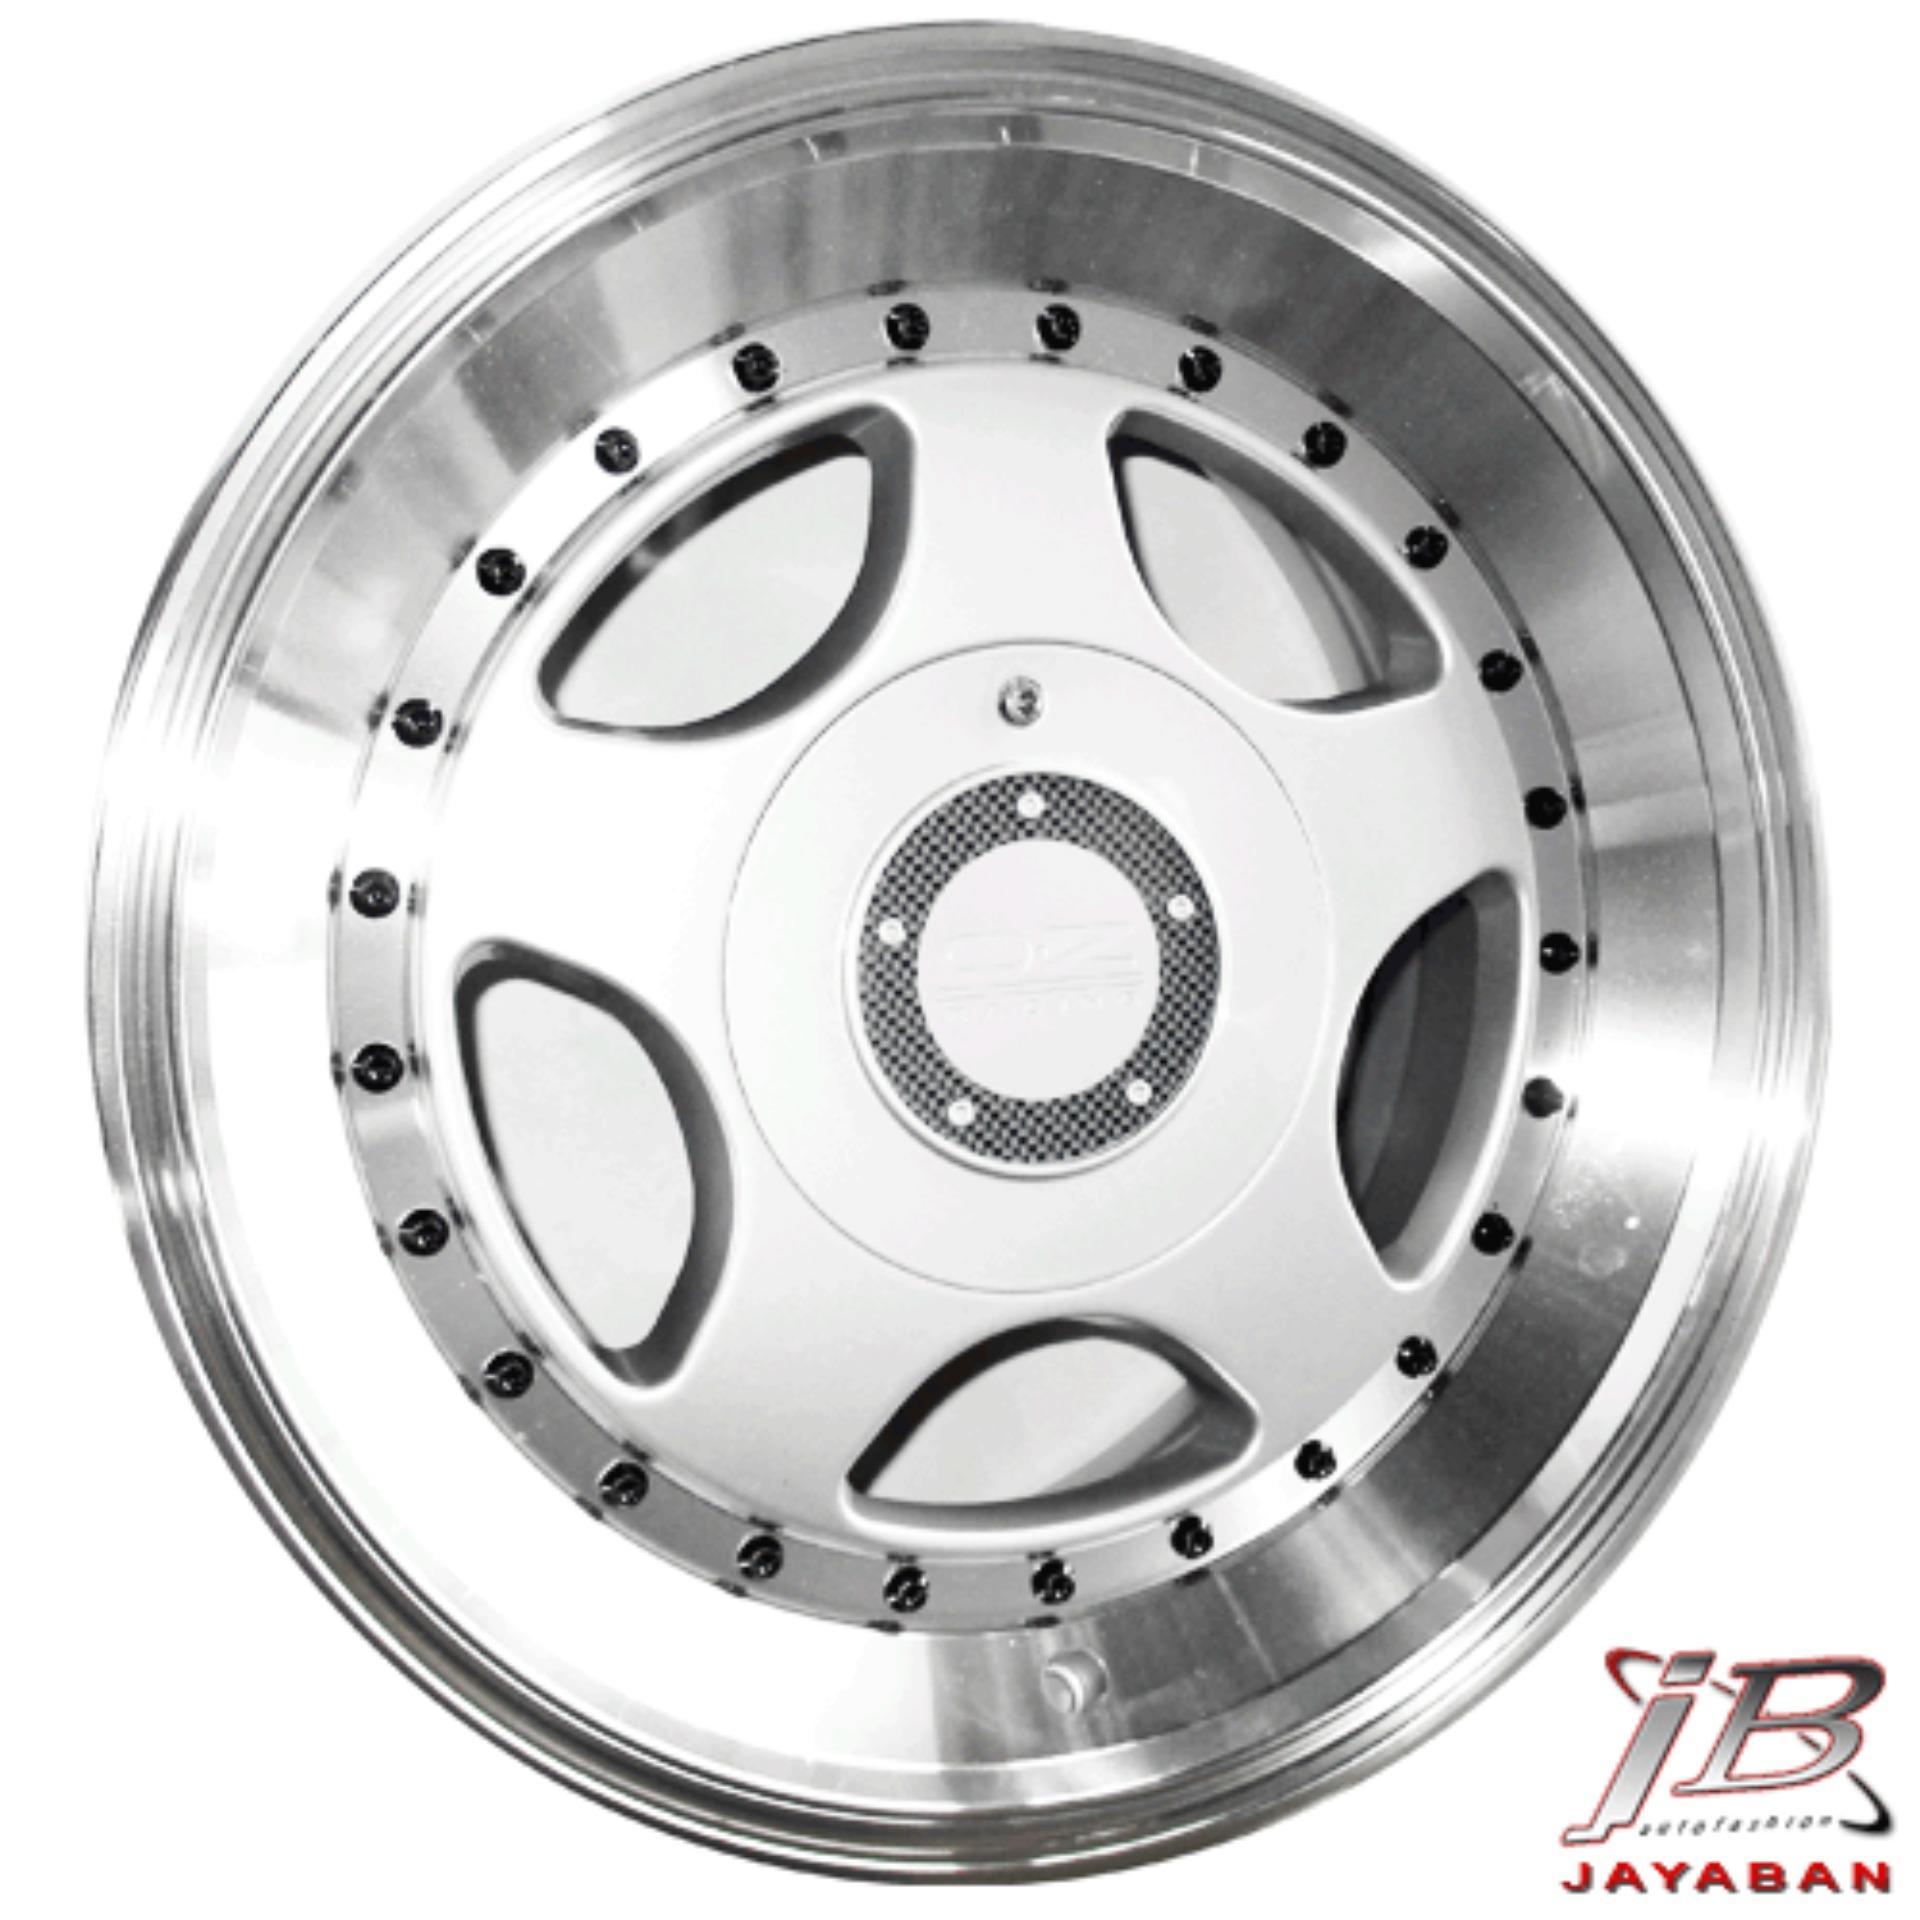 Velg racing ring 15 inch Rep. OZ Futura Lebar Belang PCD 4x100 / 4x114.3 / H8